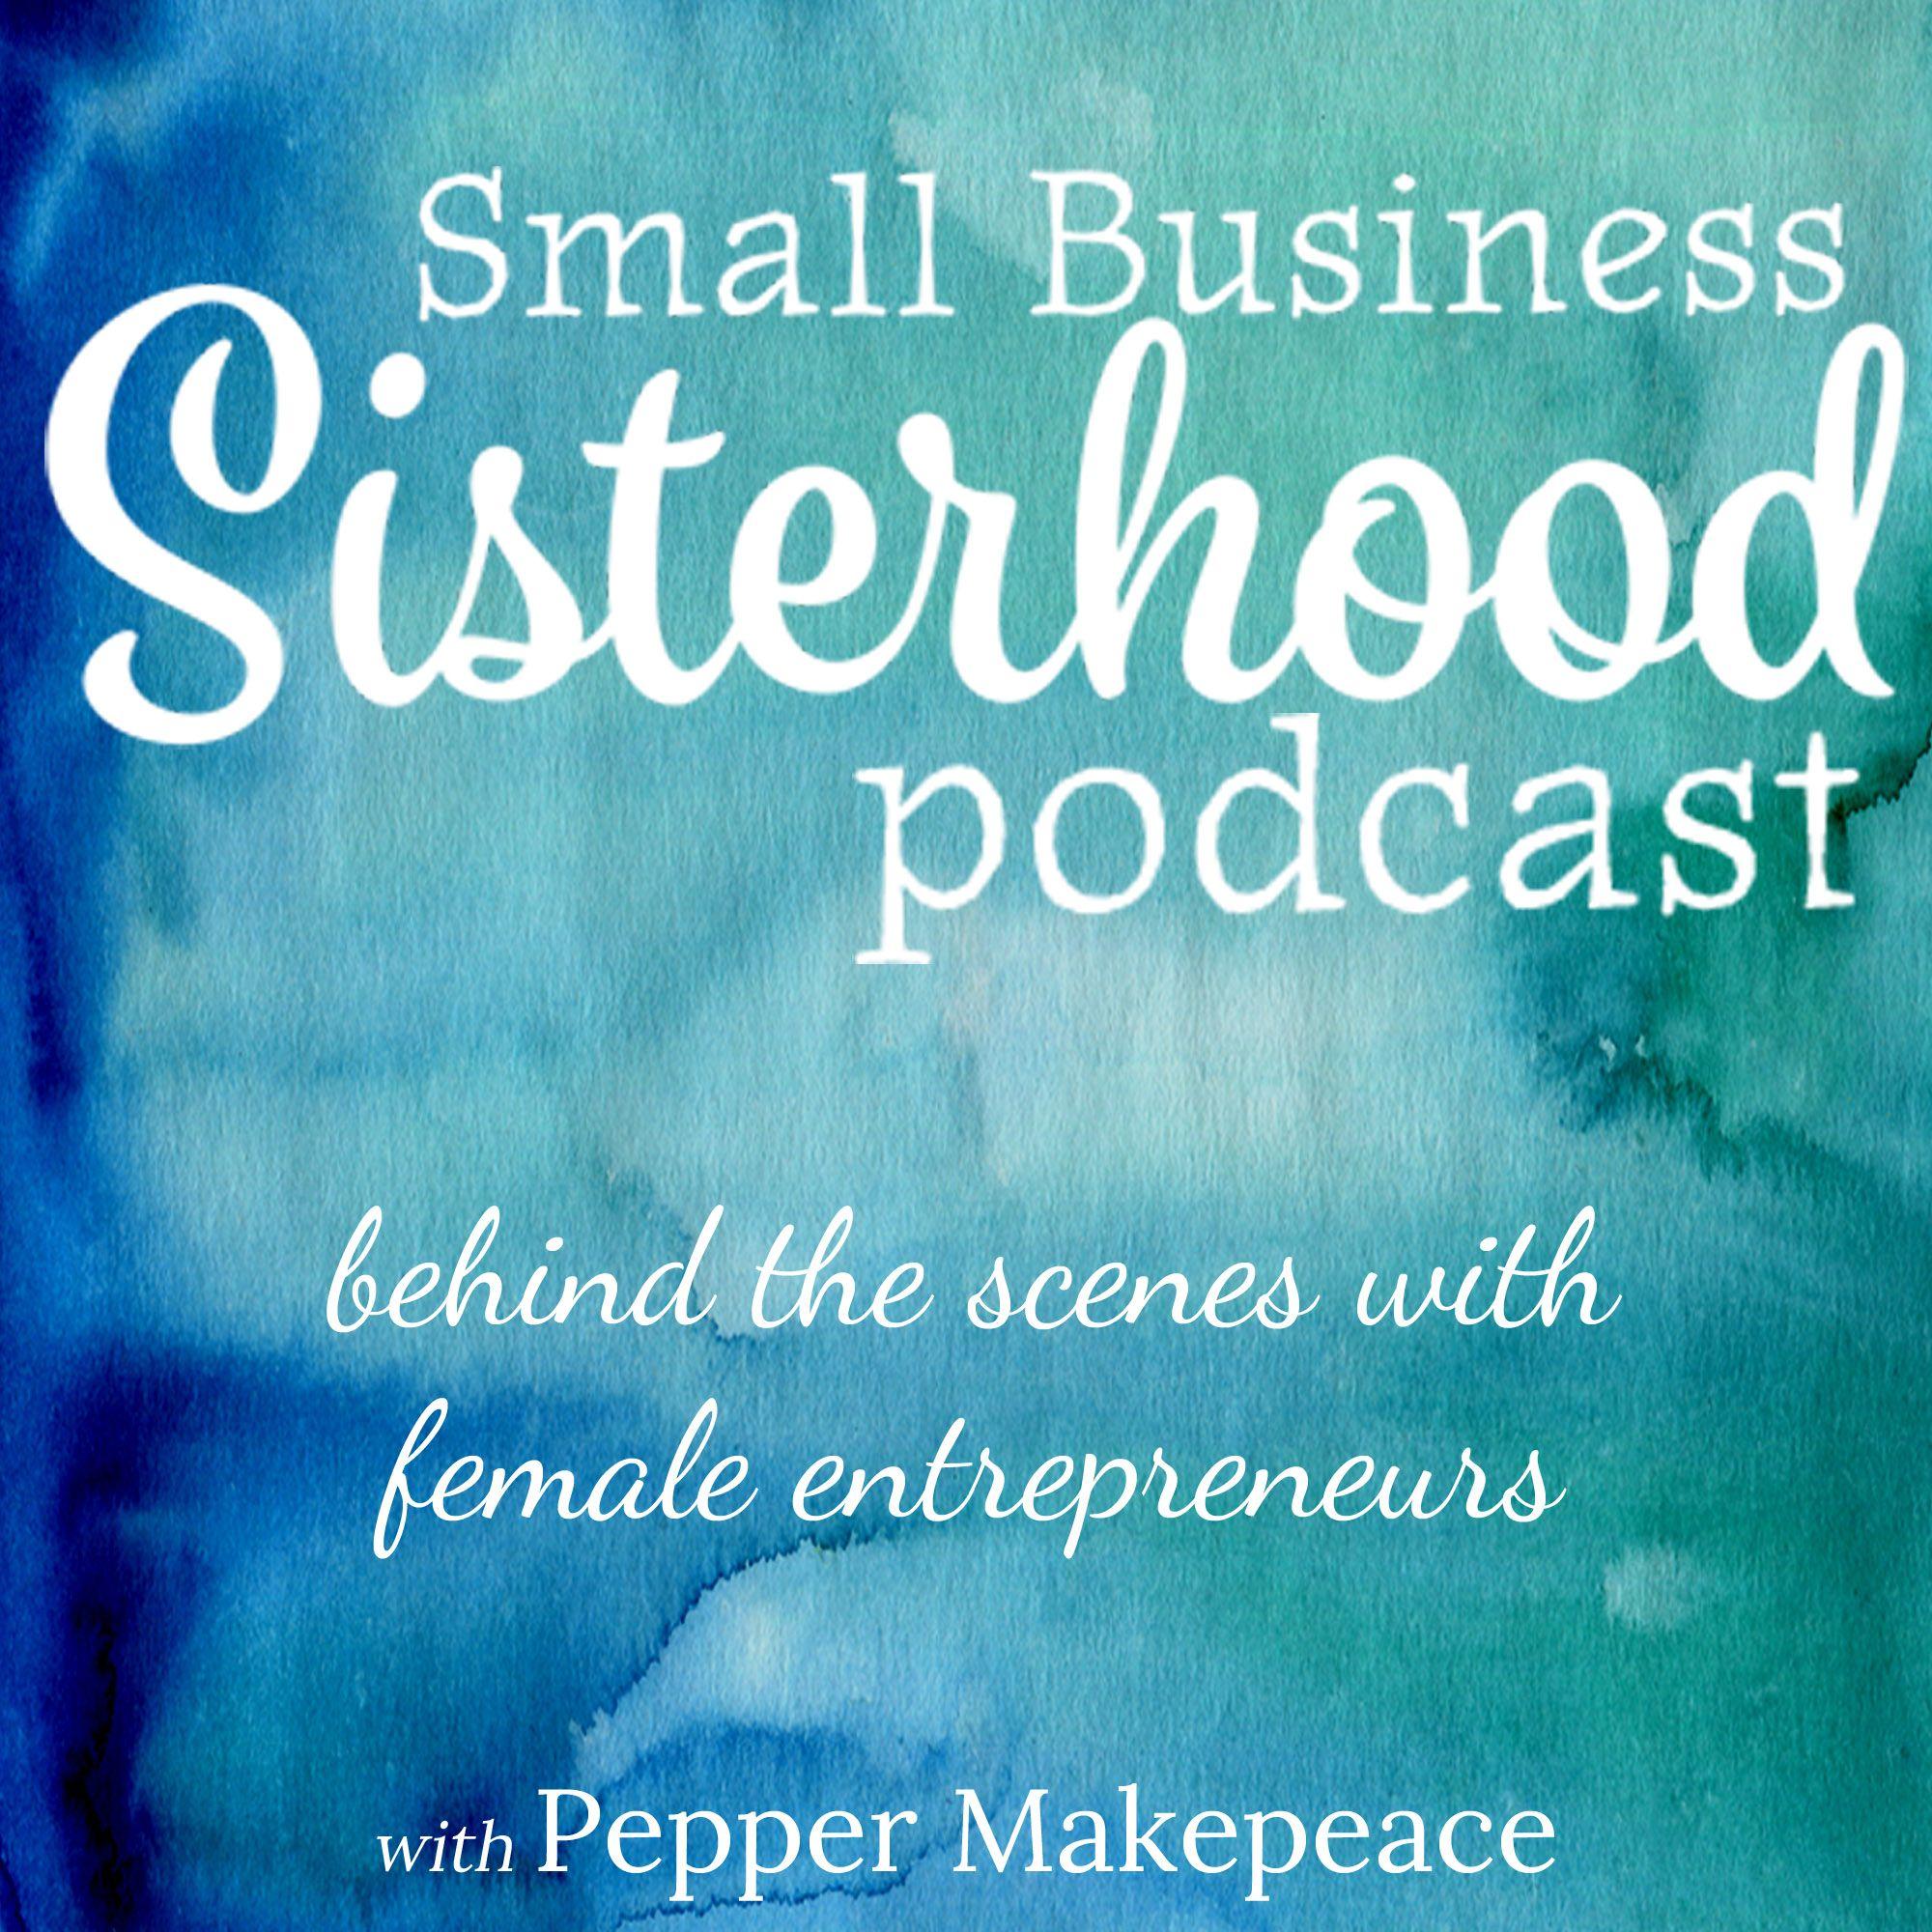 Small Business Sisterhood Podcast: Online Business, Blogging, Creative Entrepreneurs, Business Community